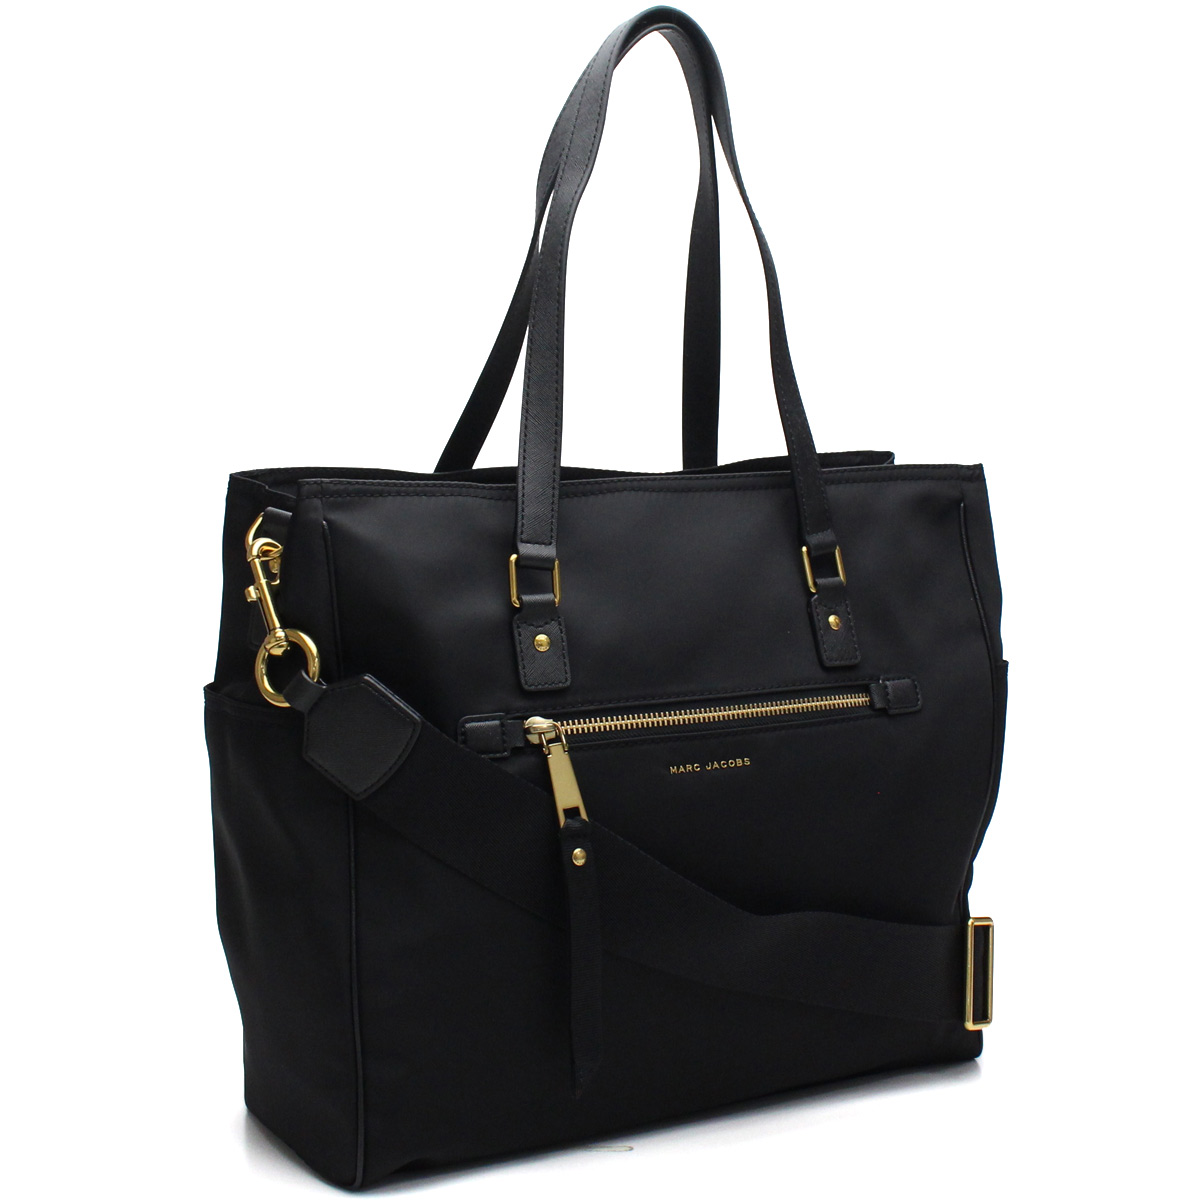 Shoulder Bag for Women On Sale, Black, Nylon, 2017, one size Marc Jacobs